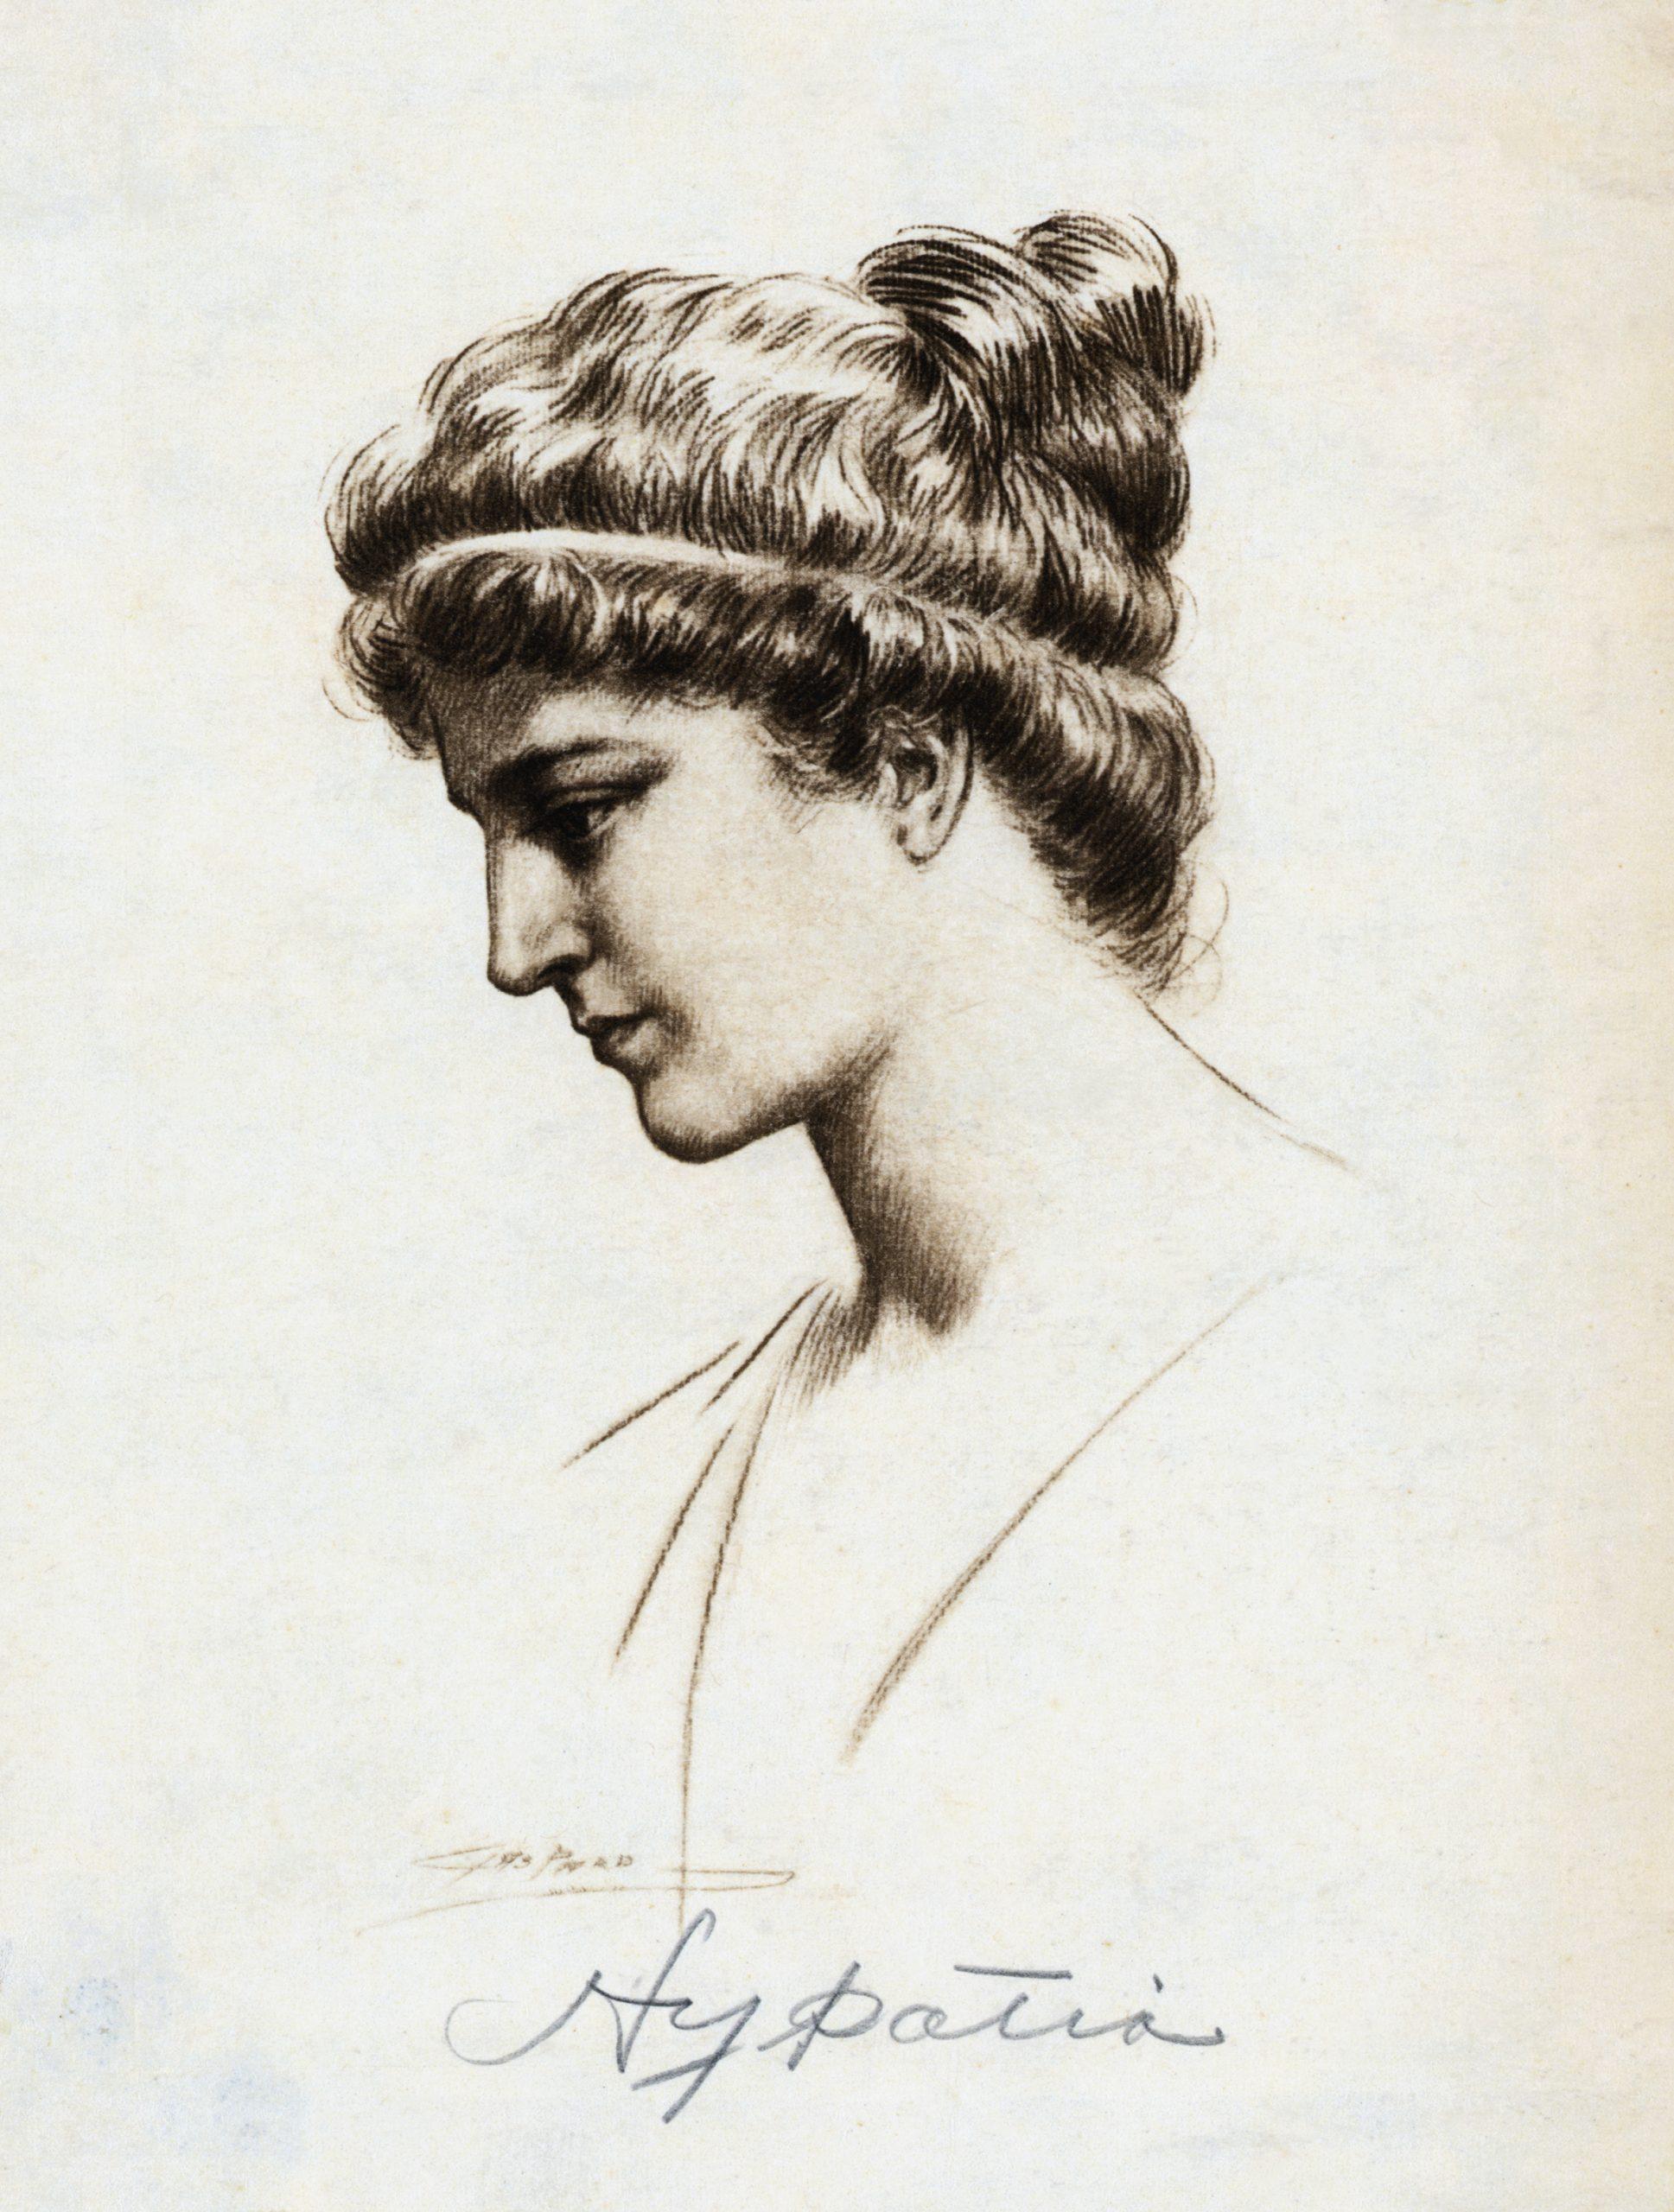 Profile of Greek Mathematician Hypatia